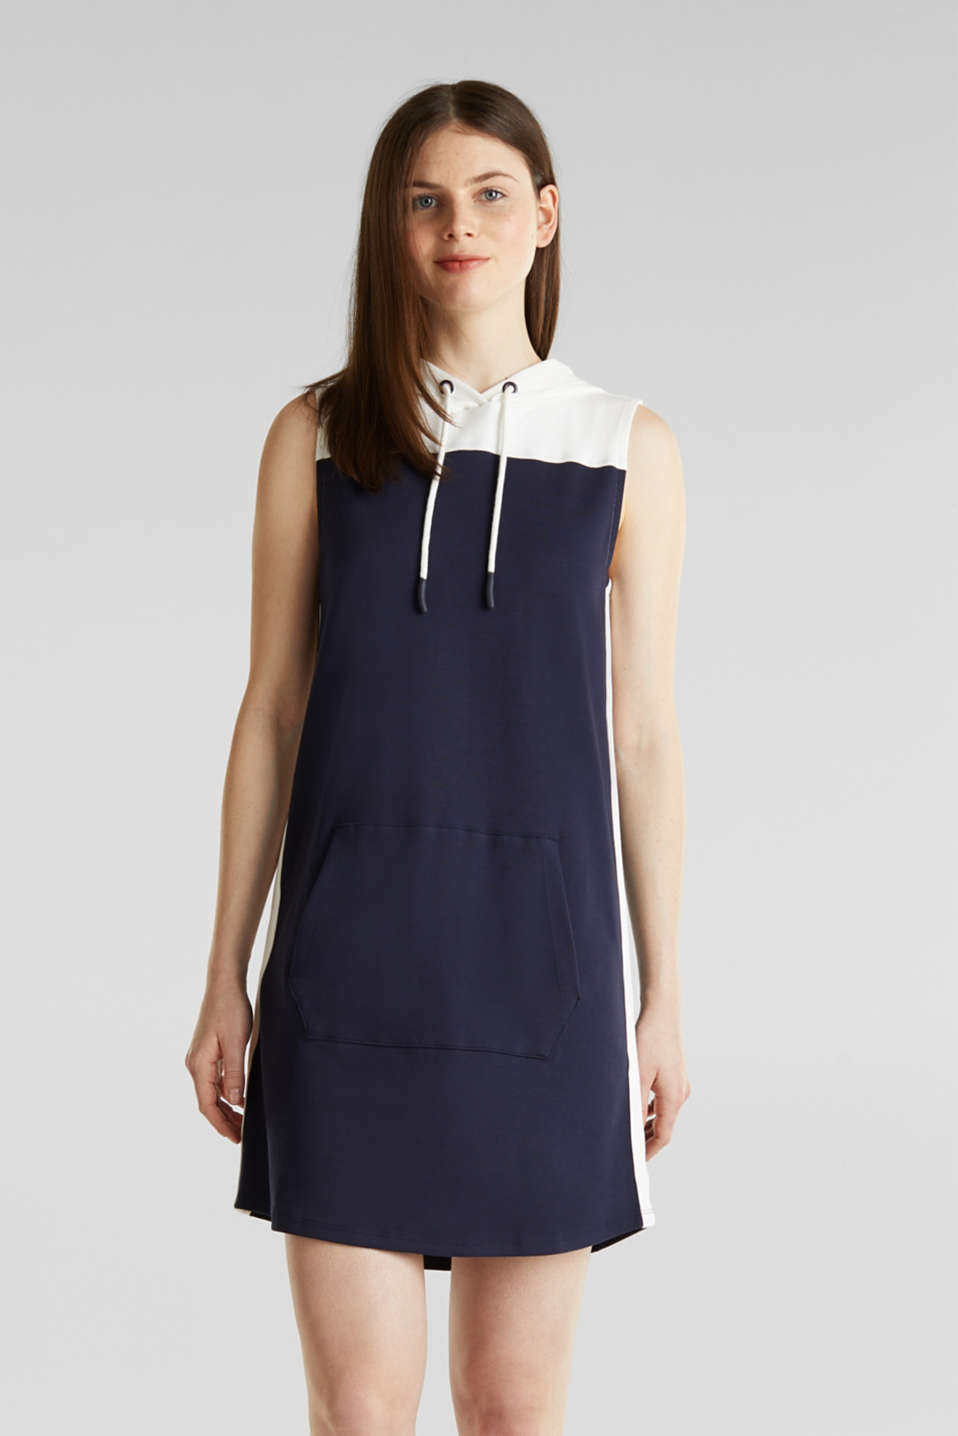 Hooded sweatshirt fabric dress, NAVY, detail image number 6